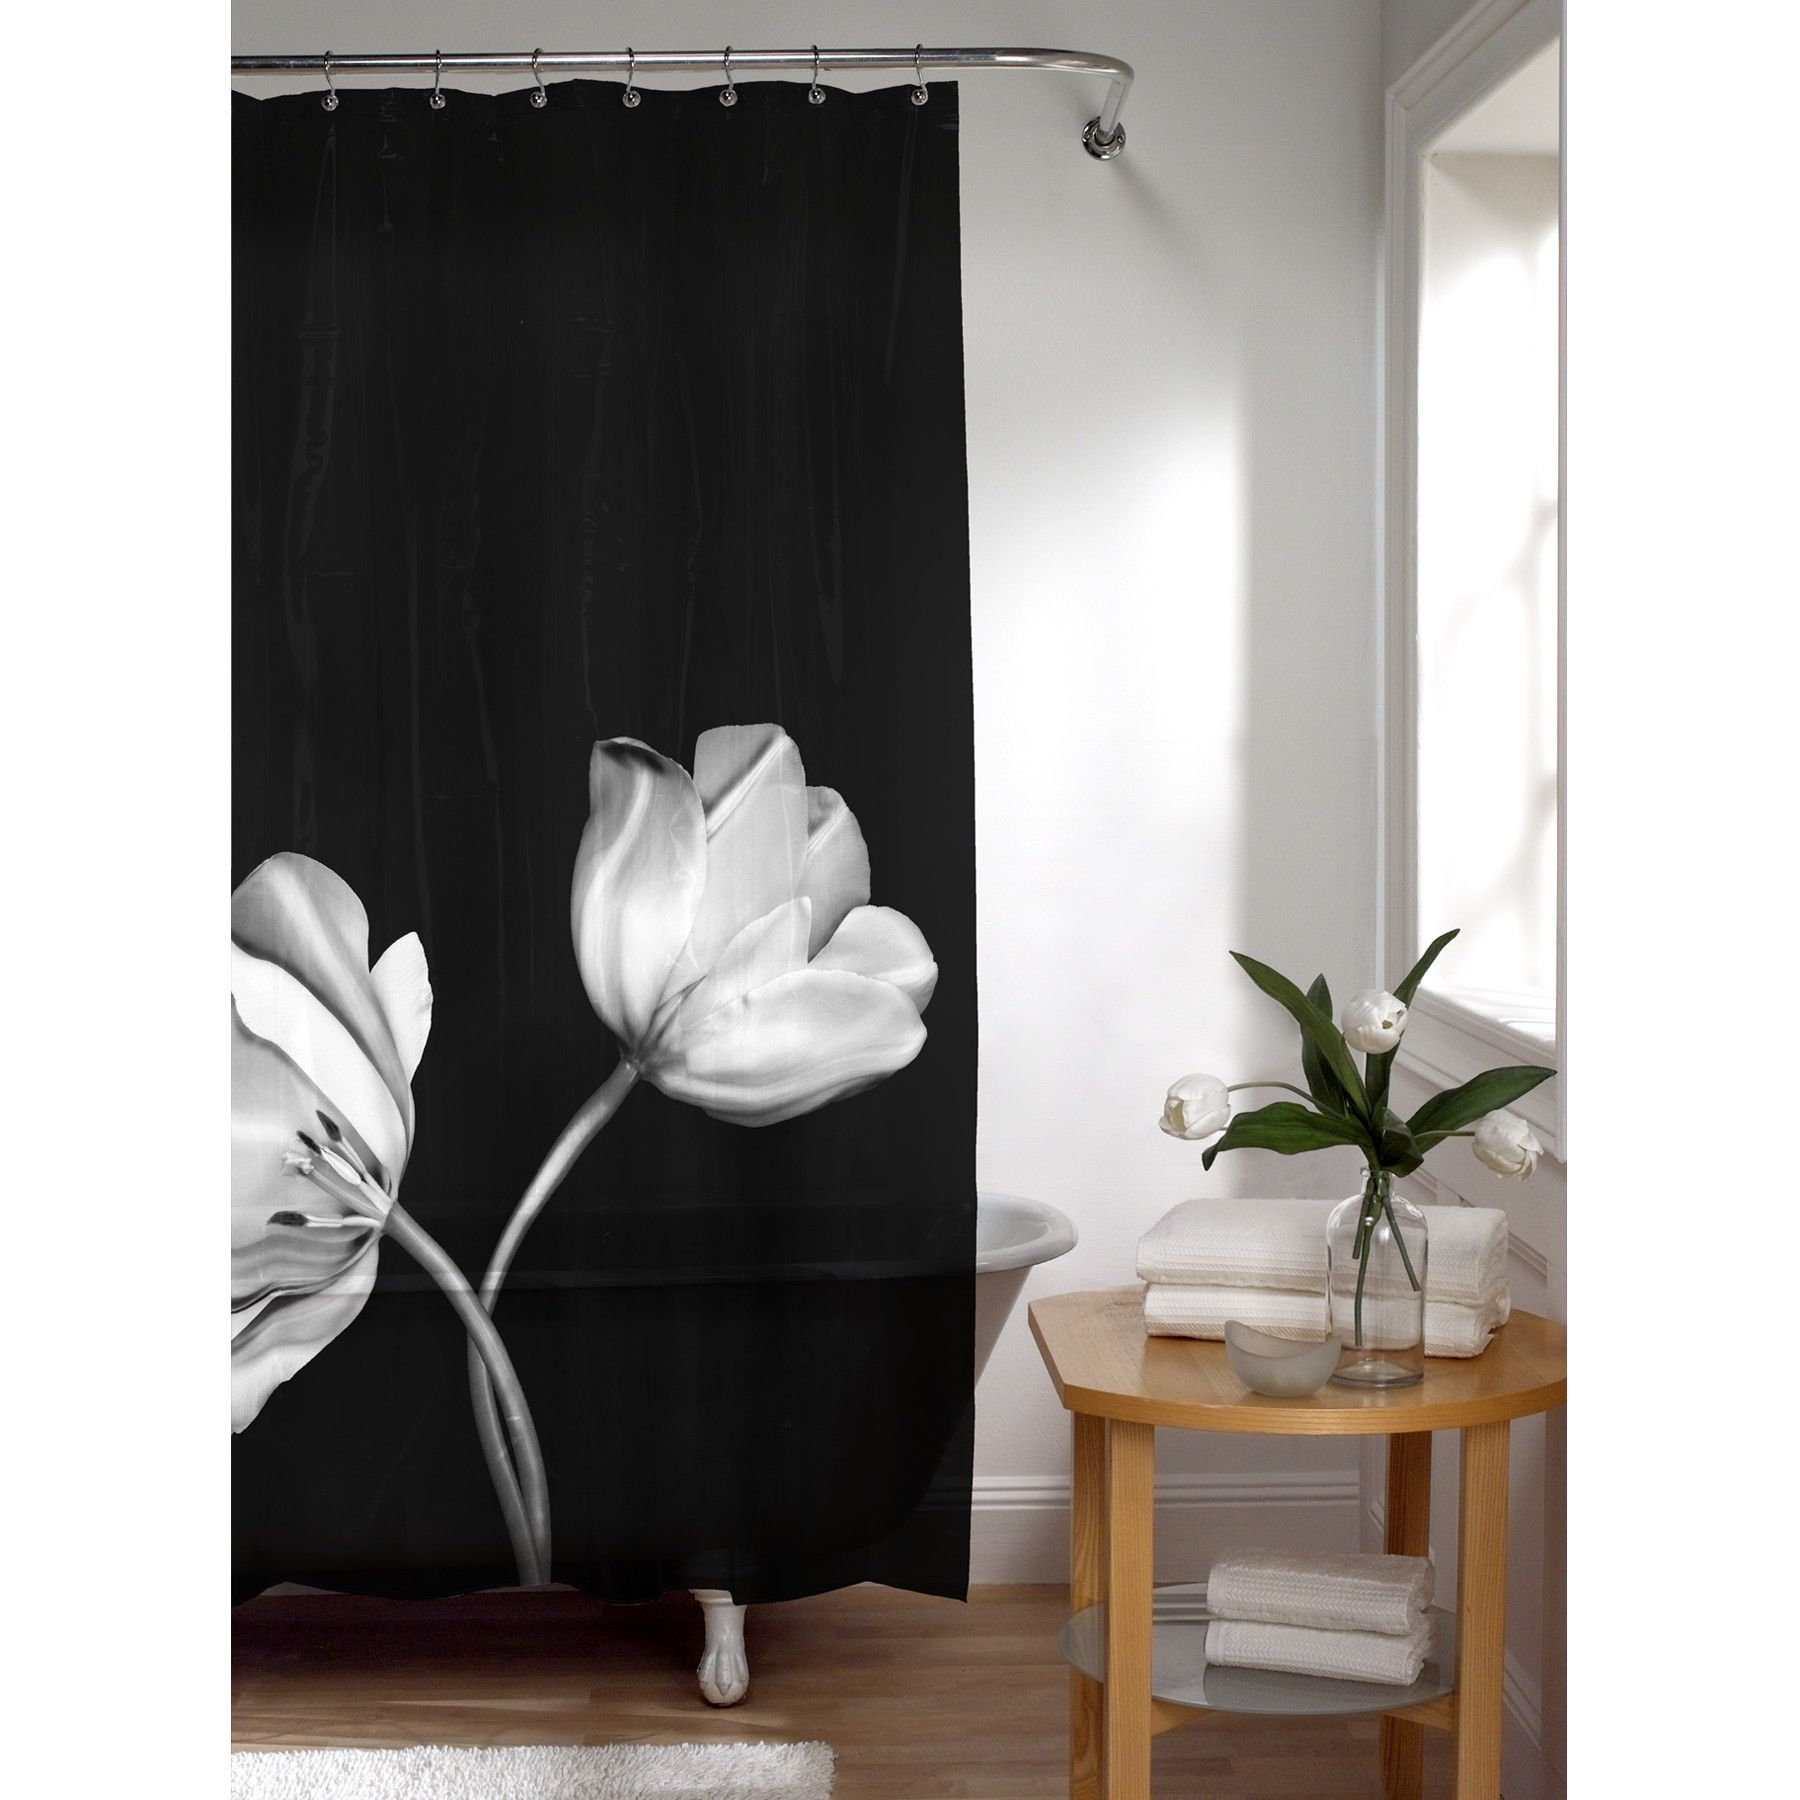 Maytex Tulip Photoreal PEVA Vinyl Shower Curtain In Black